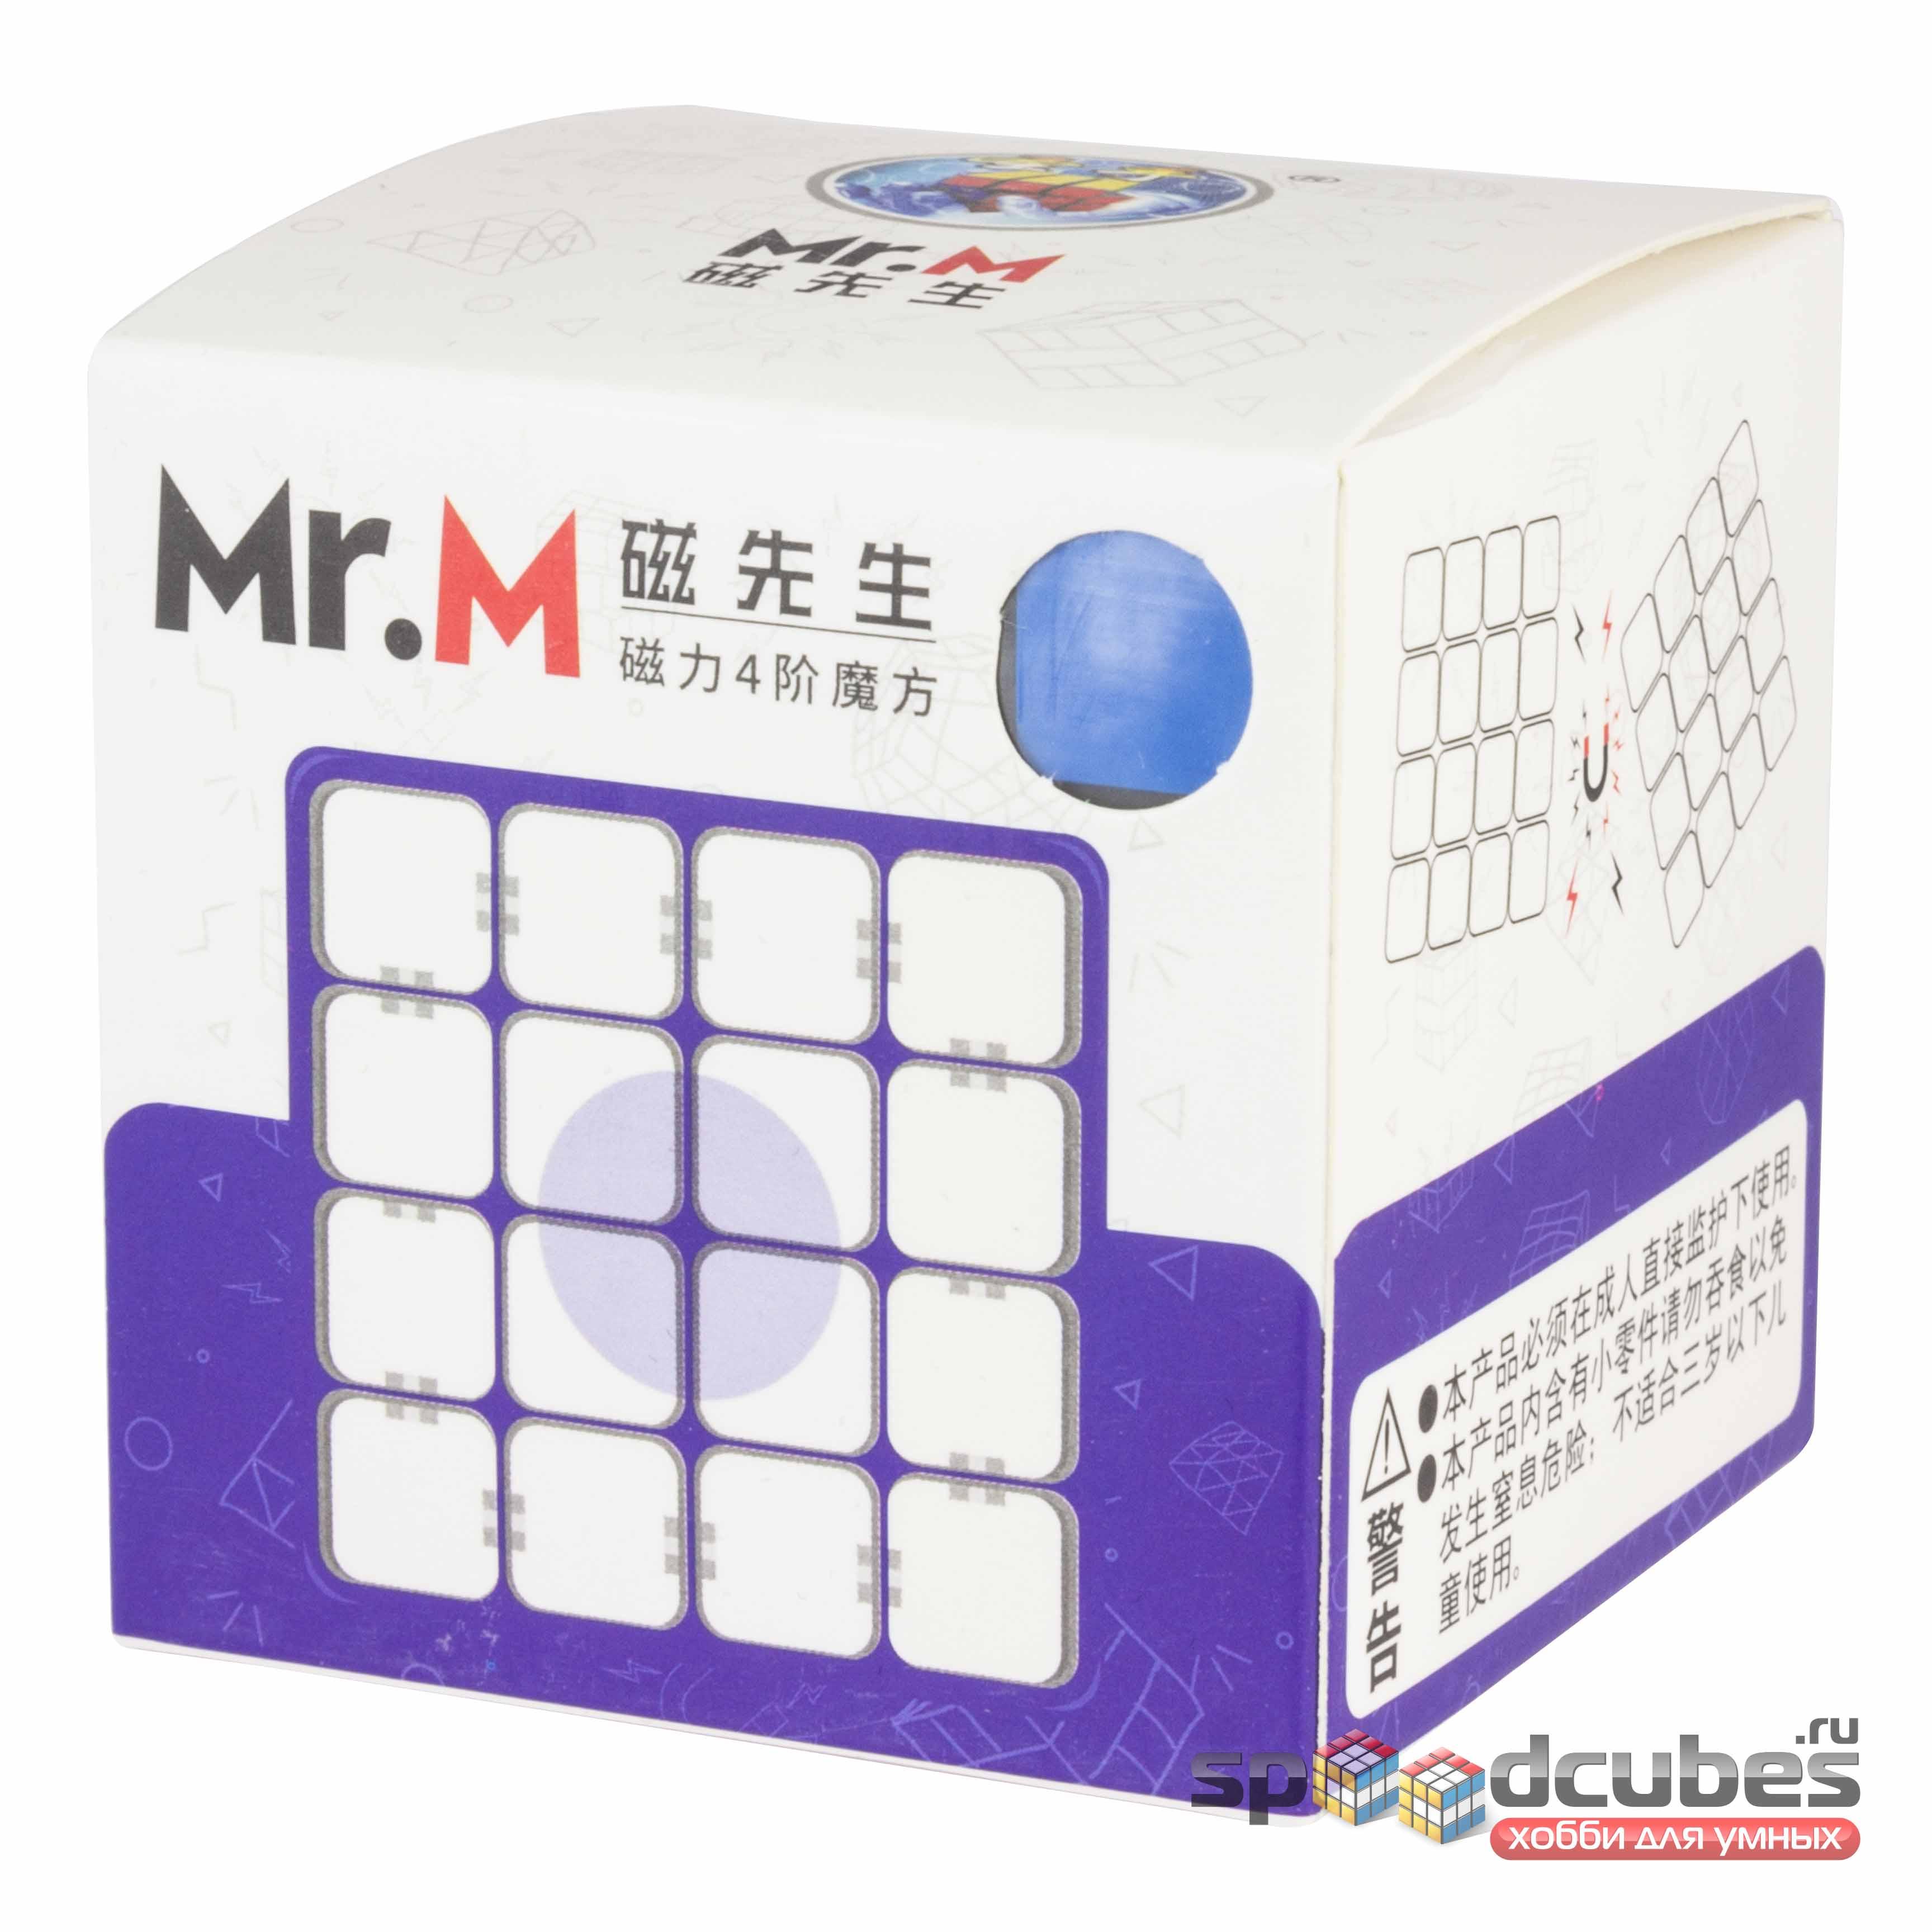 Shengshou 4x4x4 Mr M 1